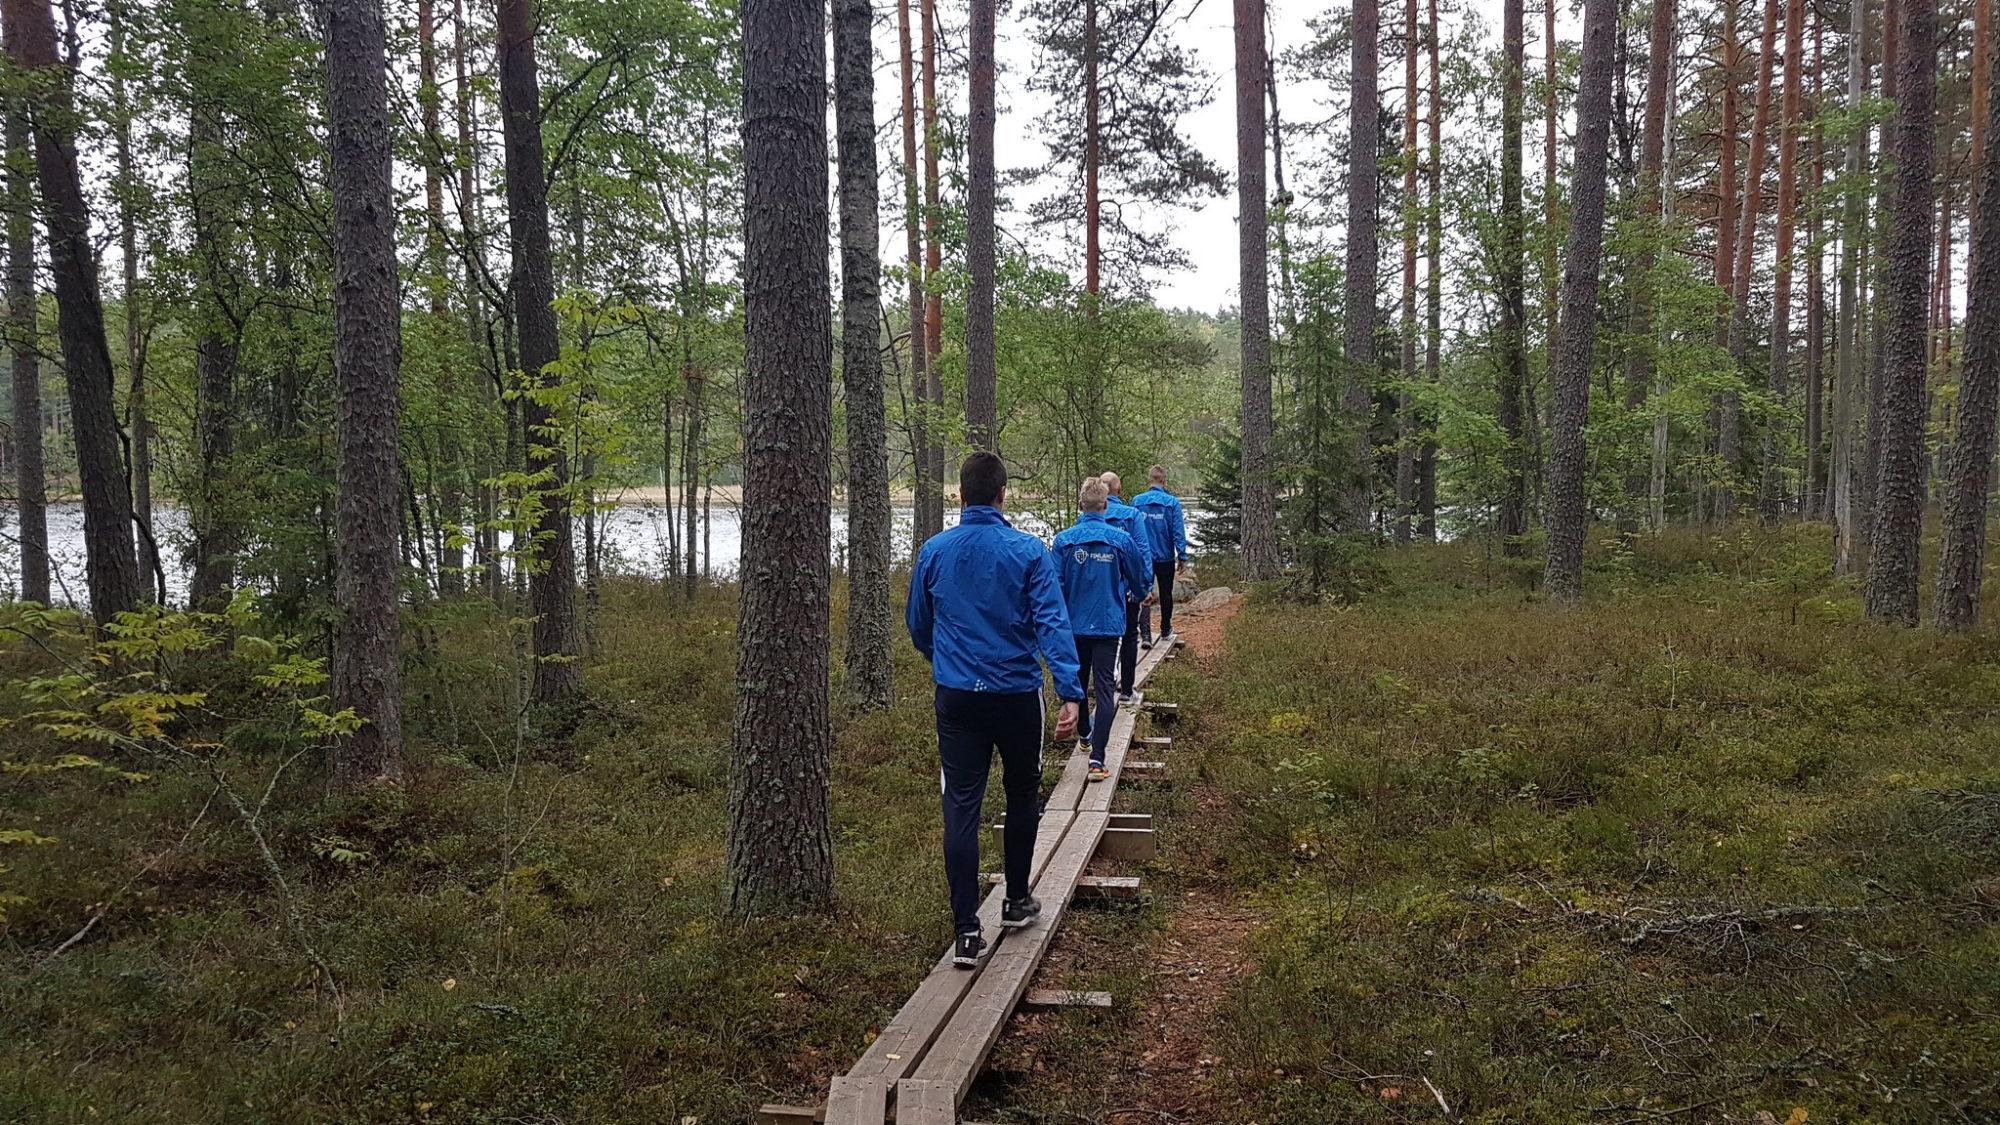 U19 salibandymaajoukkue Eerikkilä